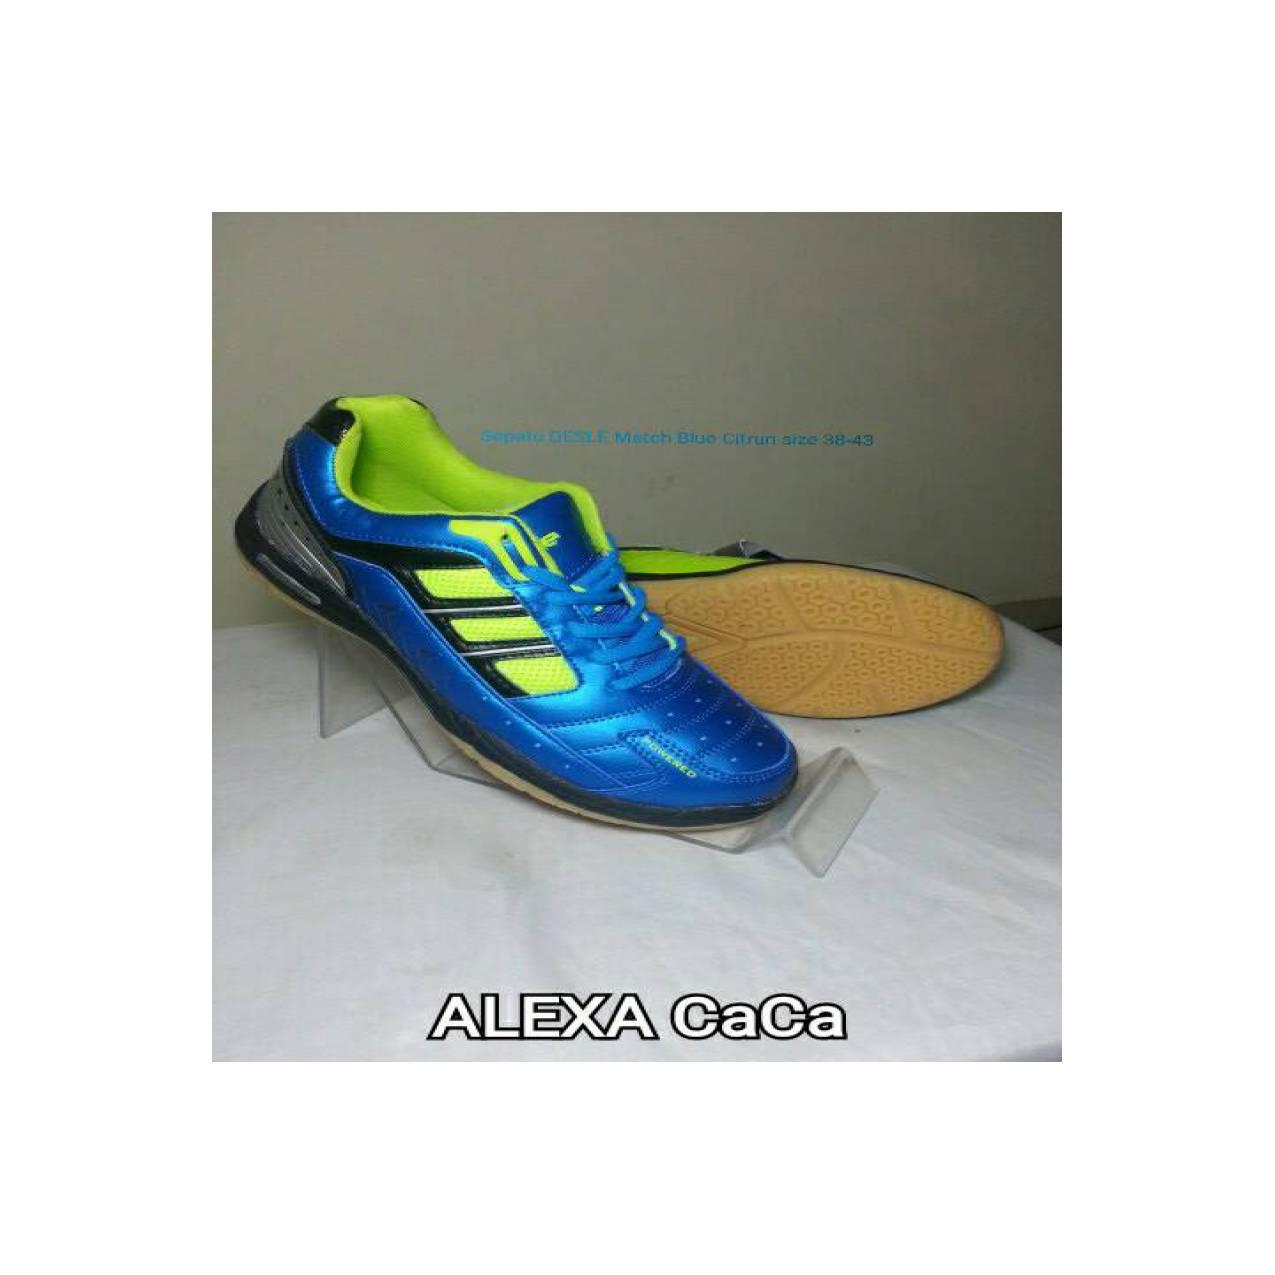 Sepatu DESLE Match blue Citrun size 38-43